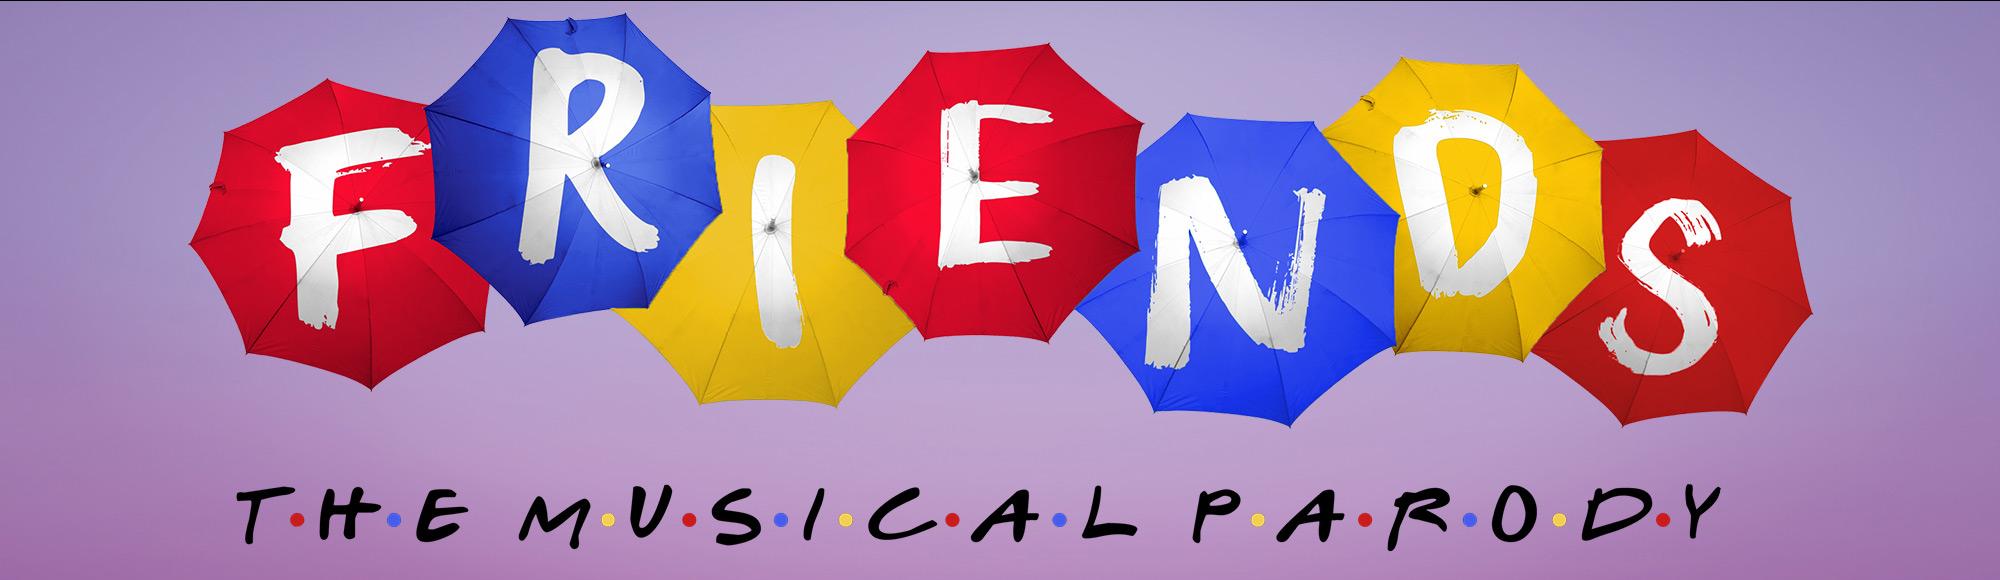 FRIENDS! The Musical Parody show